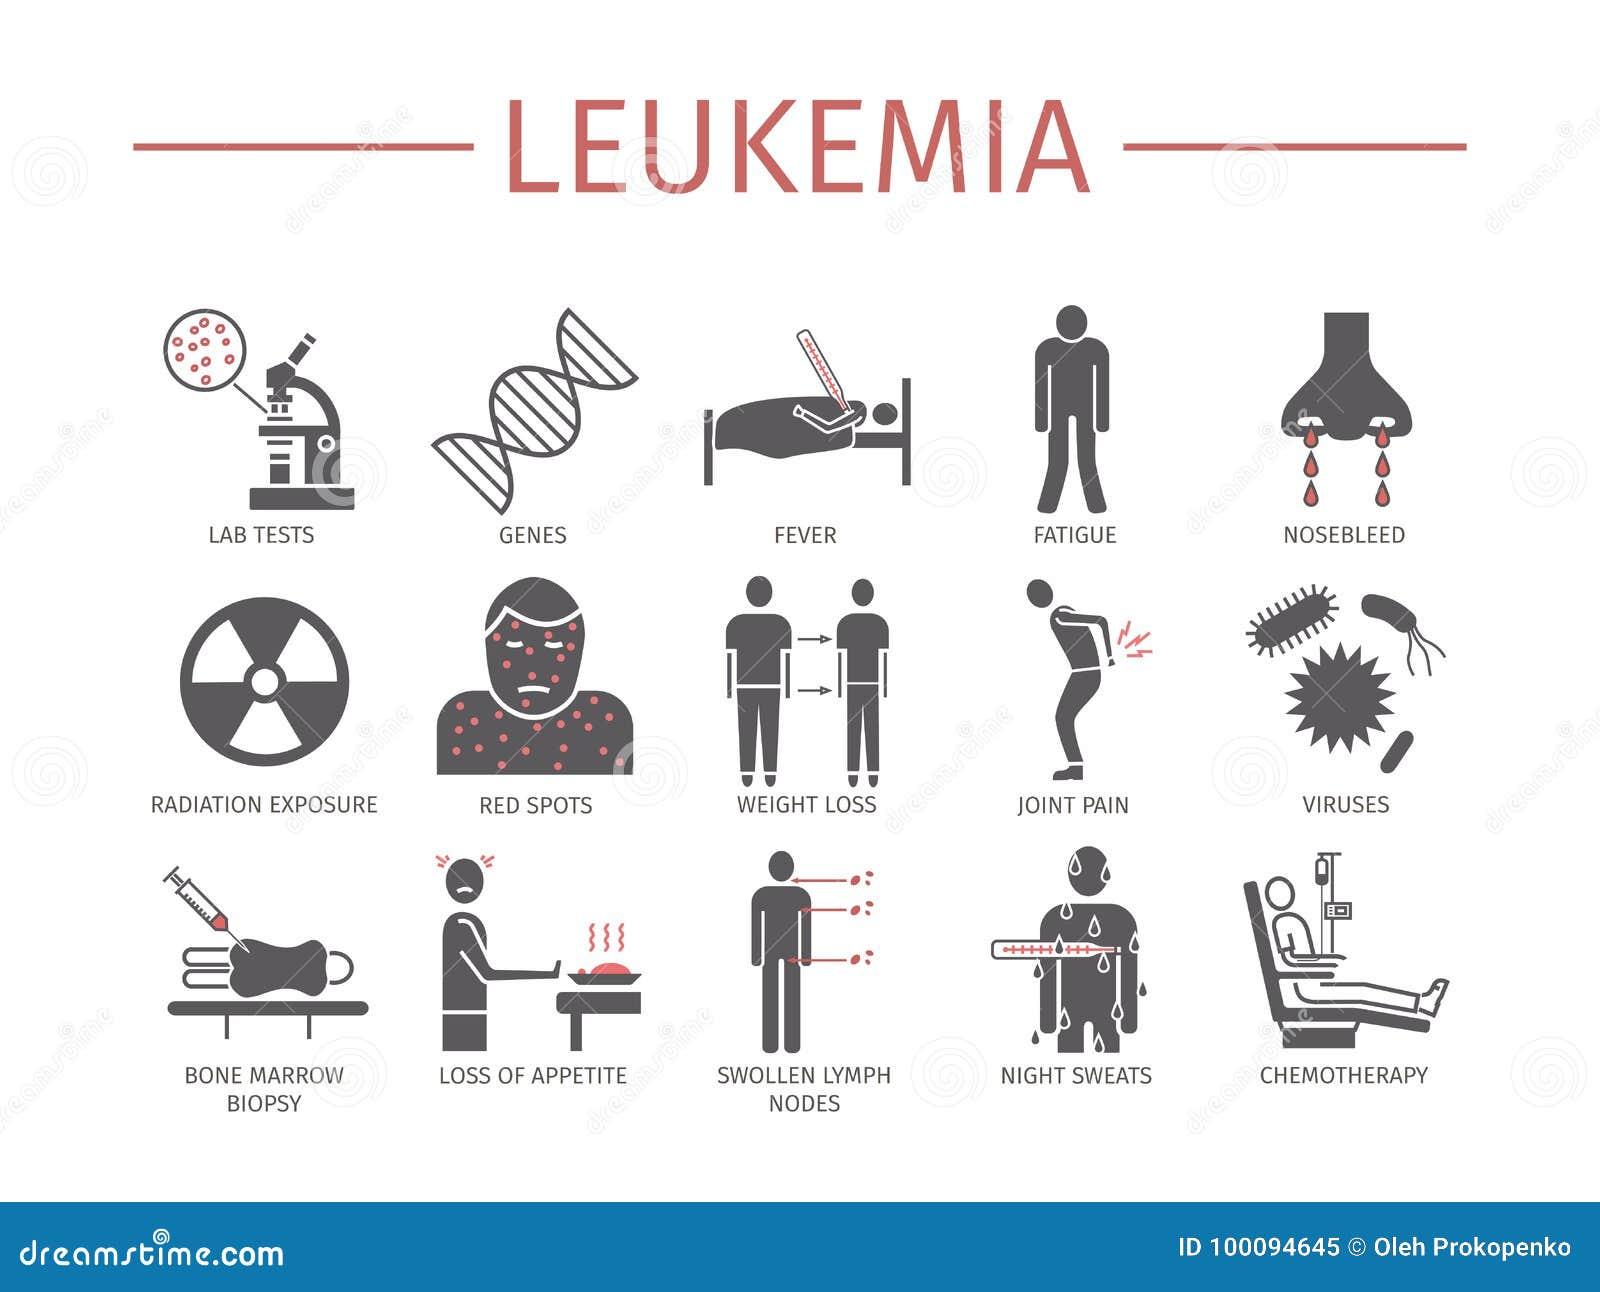 symptoms of leukemia vector illustration